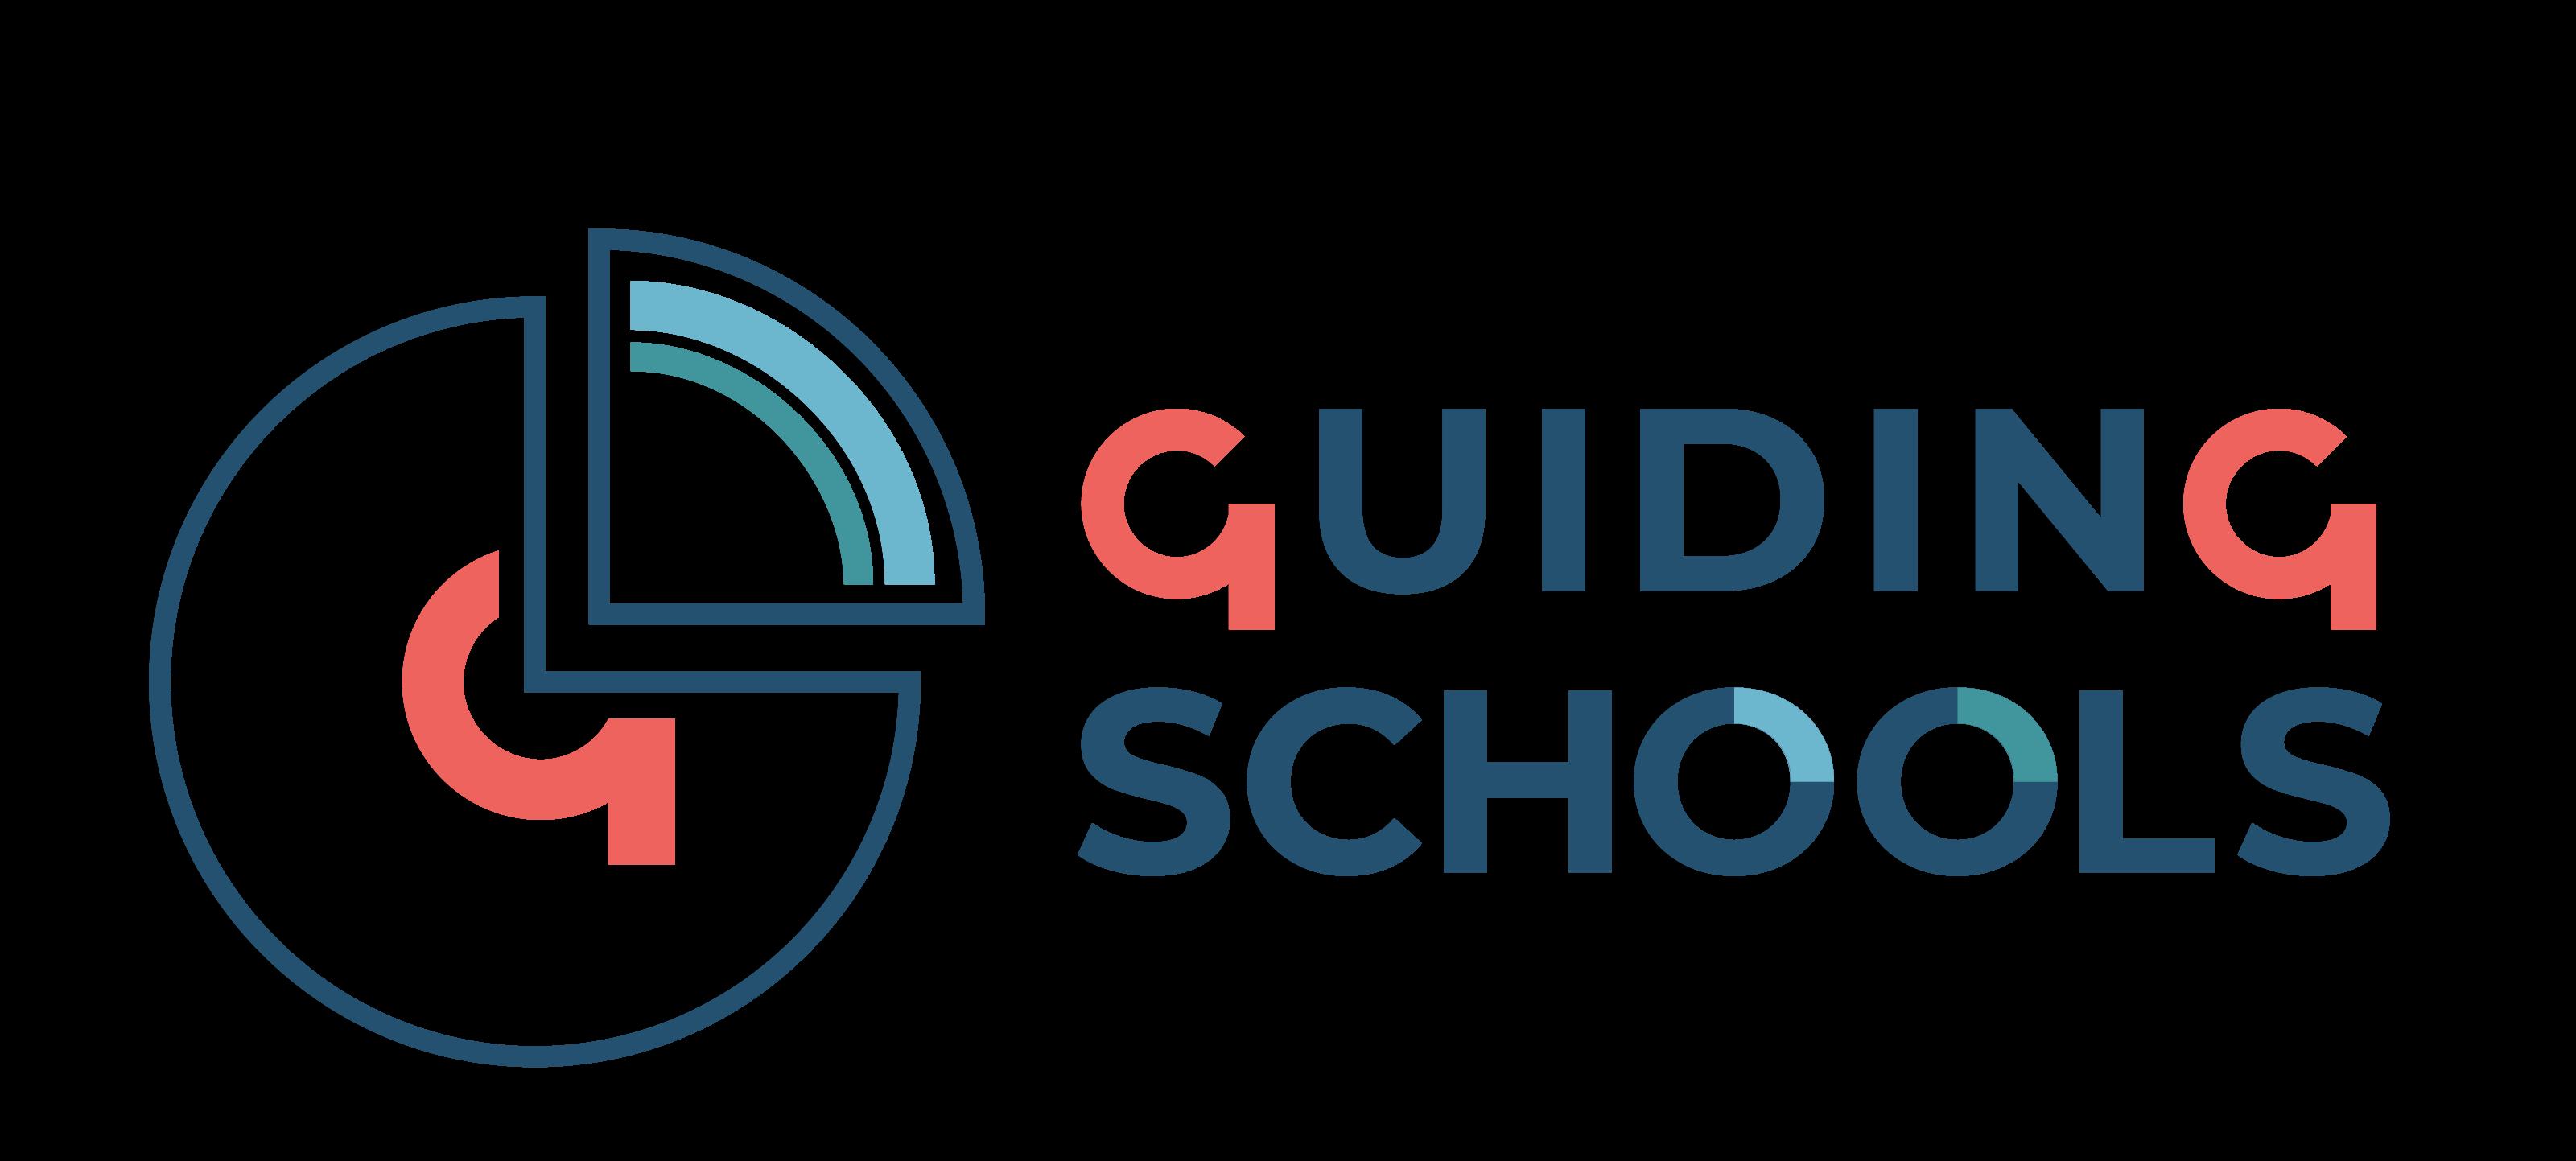 guiding schools